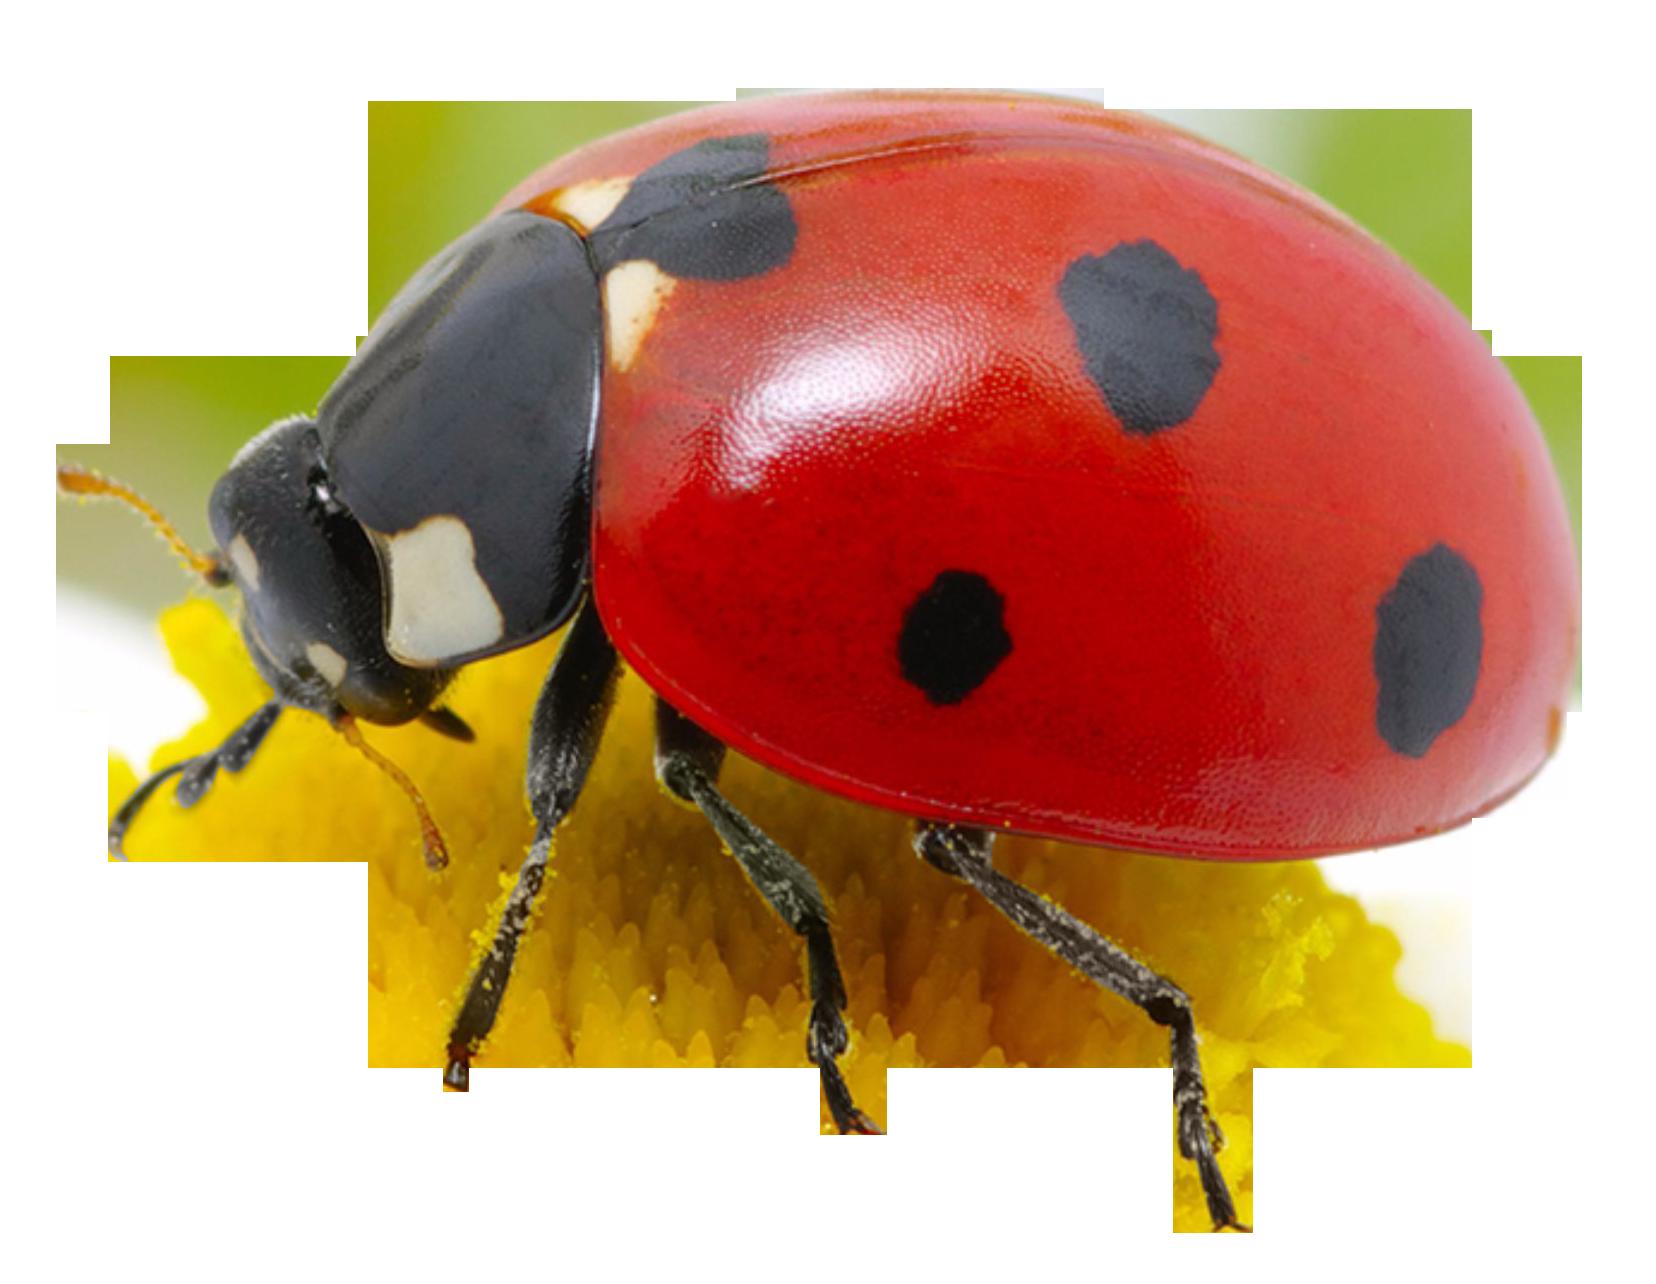 clip art royalty free stock Png image purepng free. Ladybug transparent